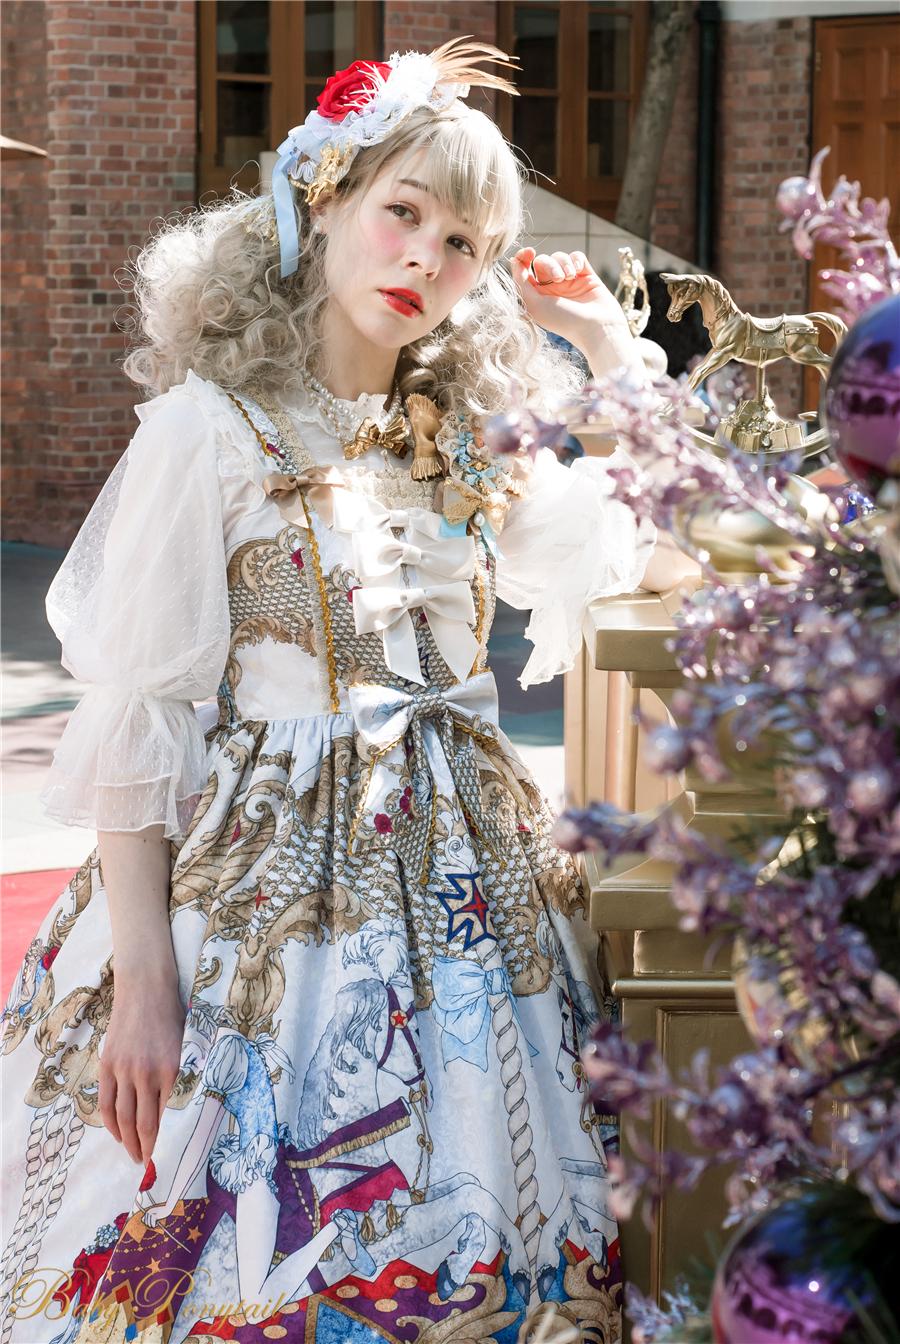 Baby Ponytail_Circus Princess_Silver JSK_Claudia24.jpg